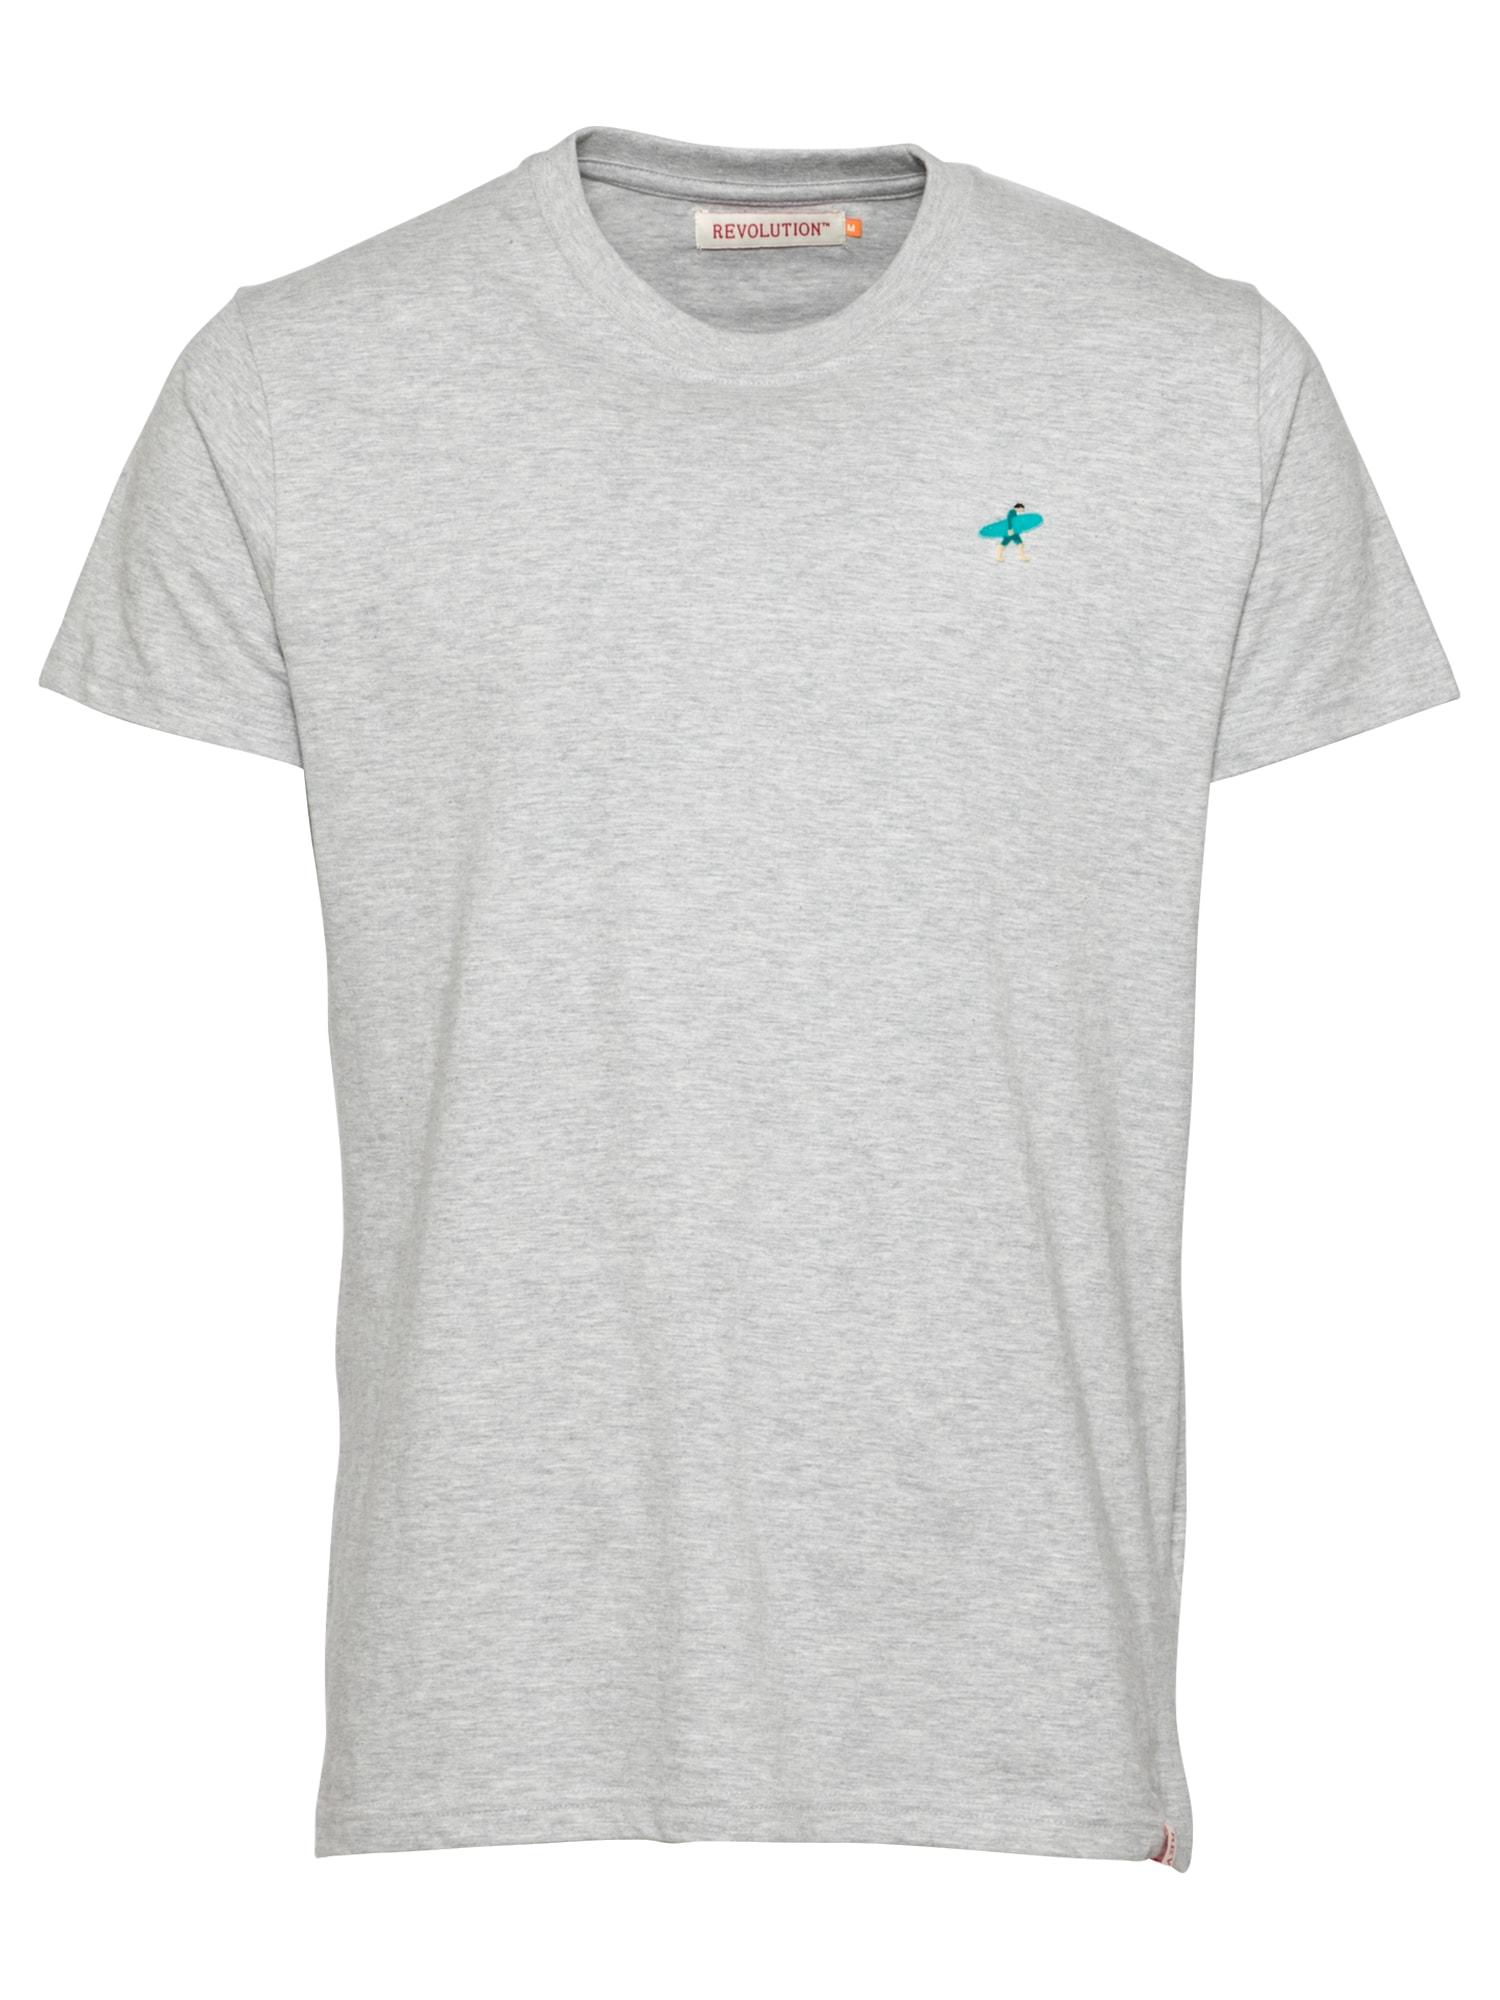 Revolution Marškinėliai margai pilka / turkio spalva / benzino spalva / smėlio spalva